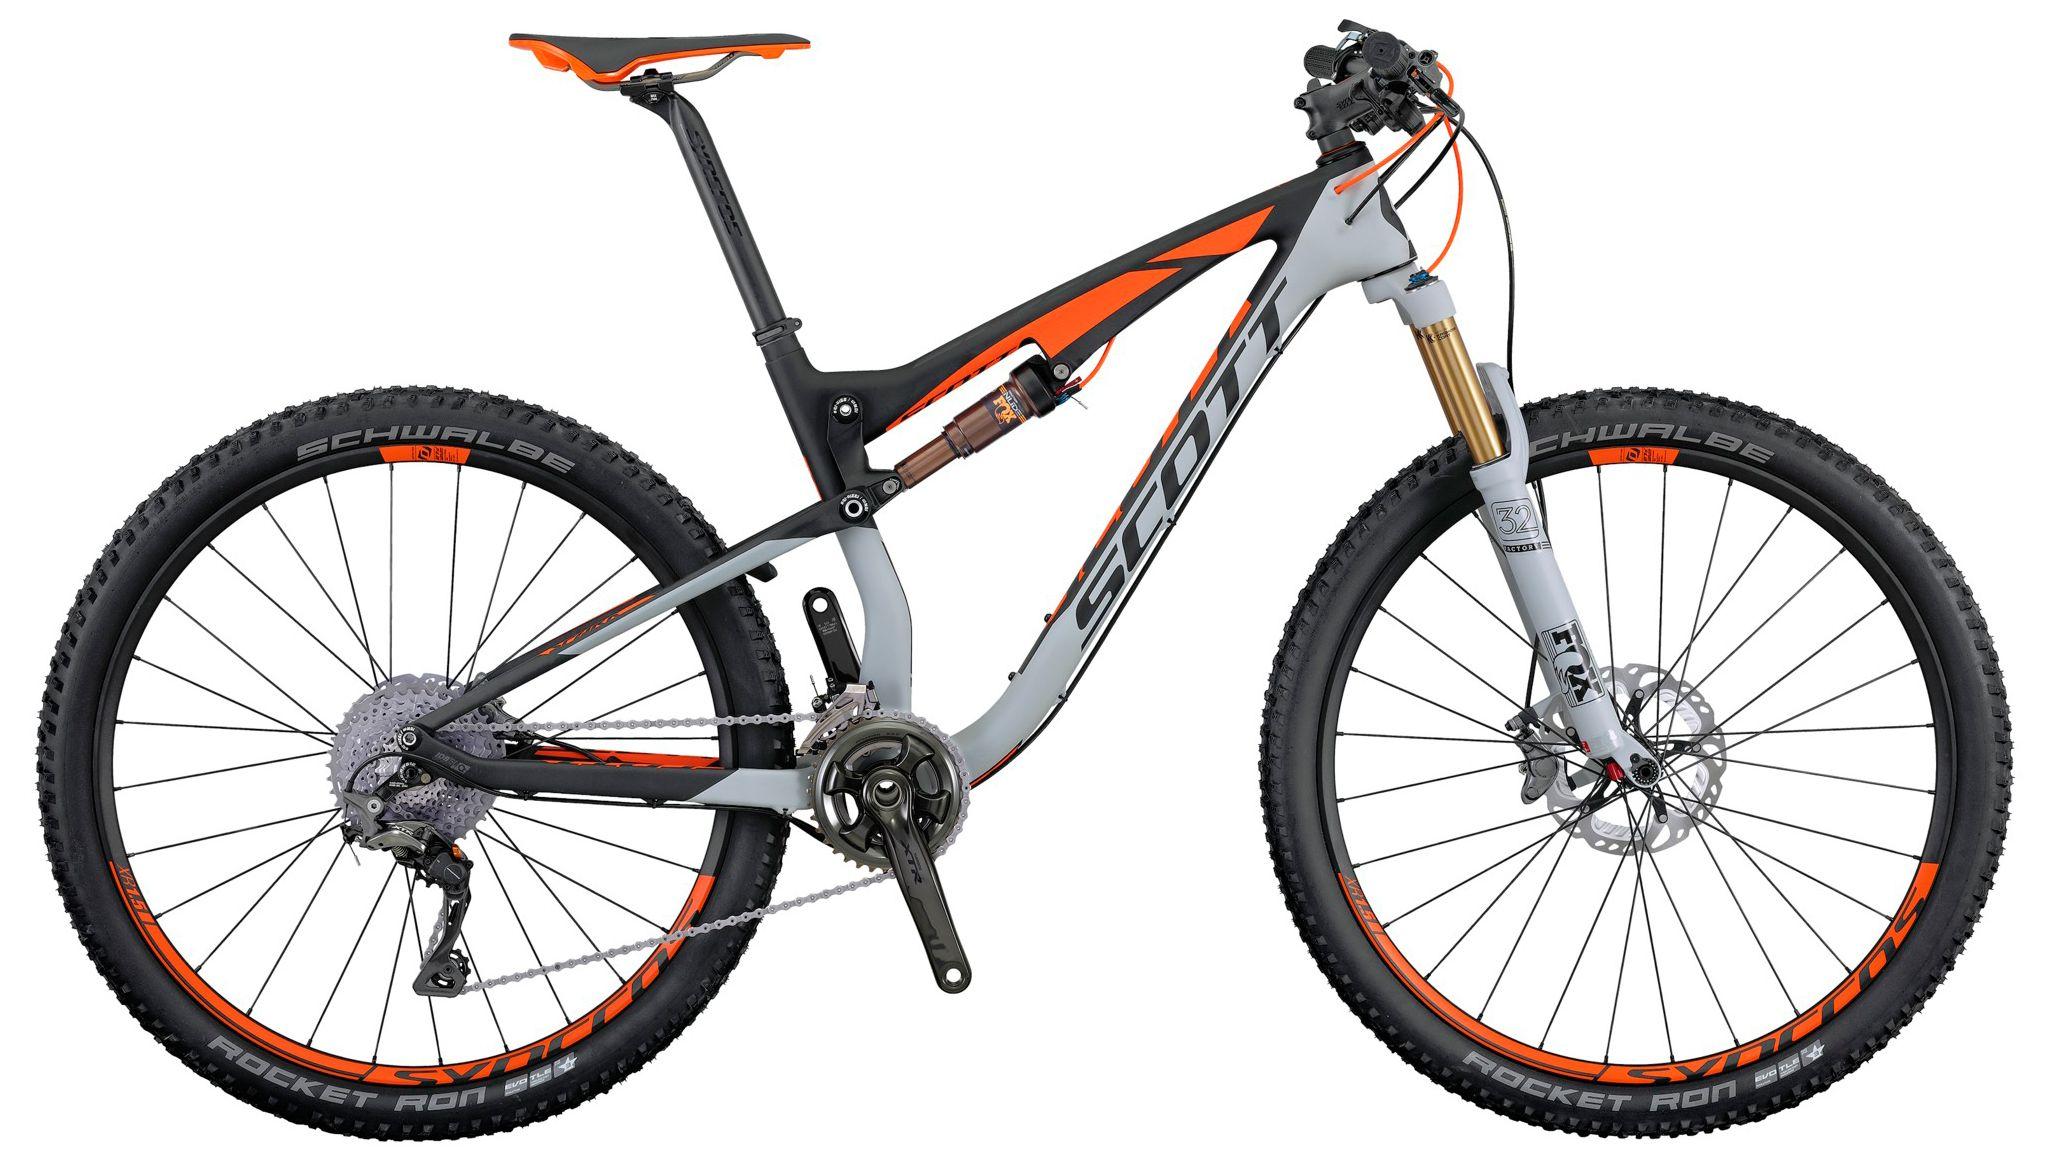 Велосипед Scott Spark 700 Premium 2016 велосипед scott spark 700 premium 2015